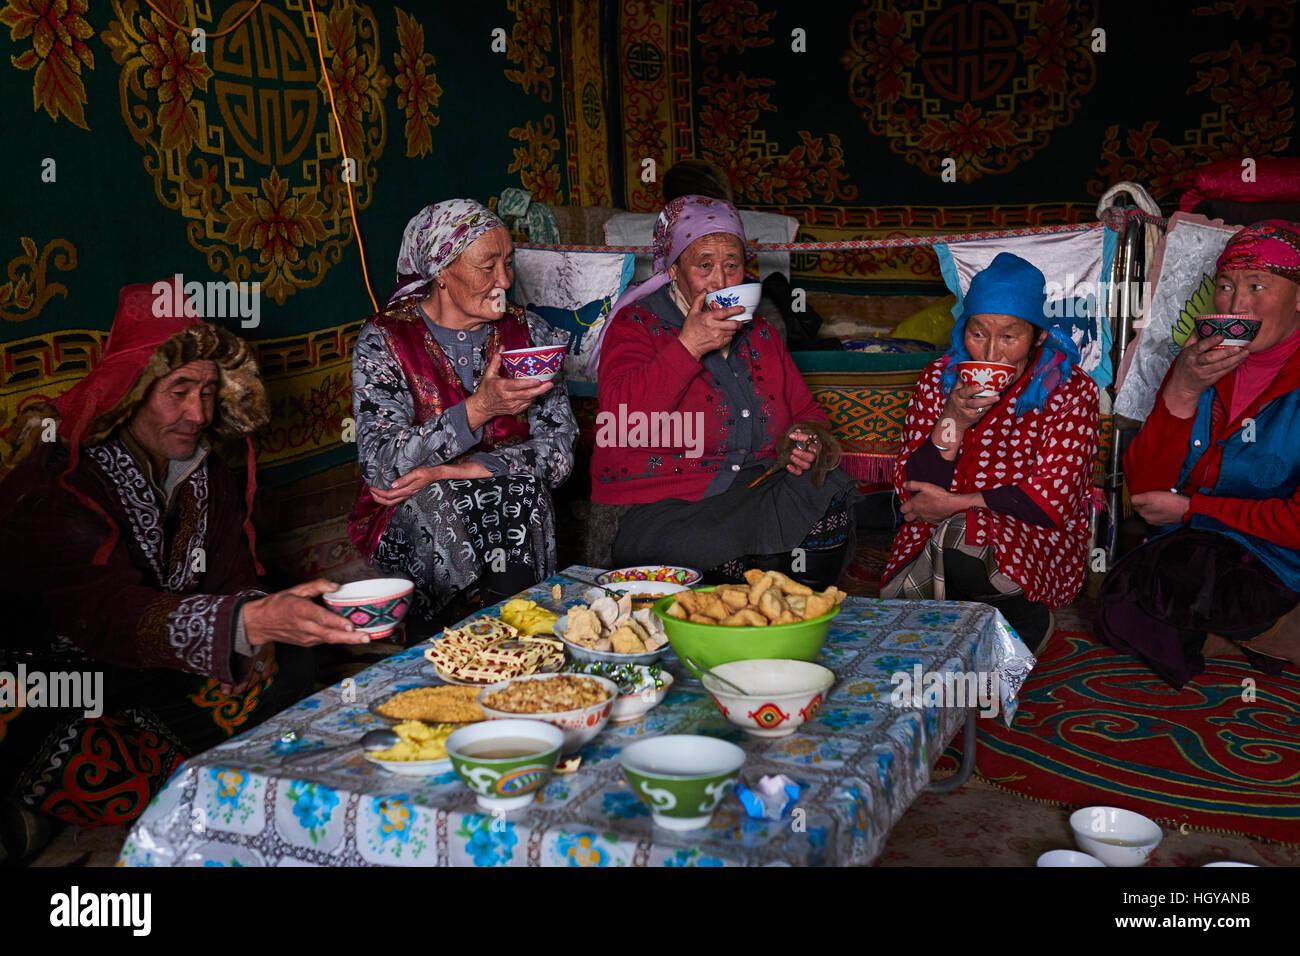 mongolia-bayan-olgii-province-landscape-